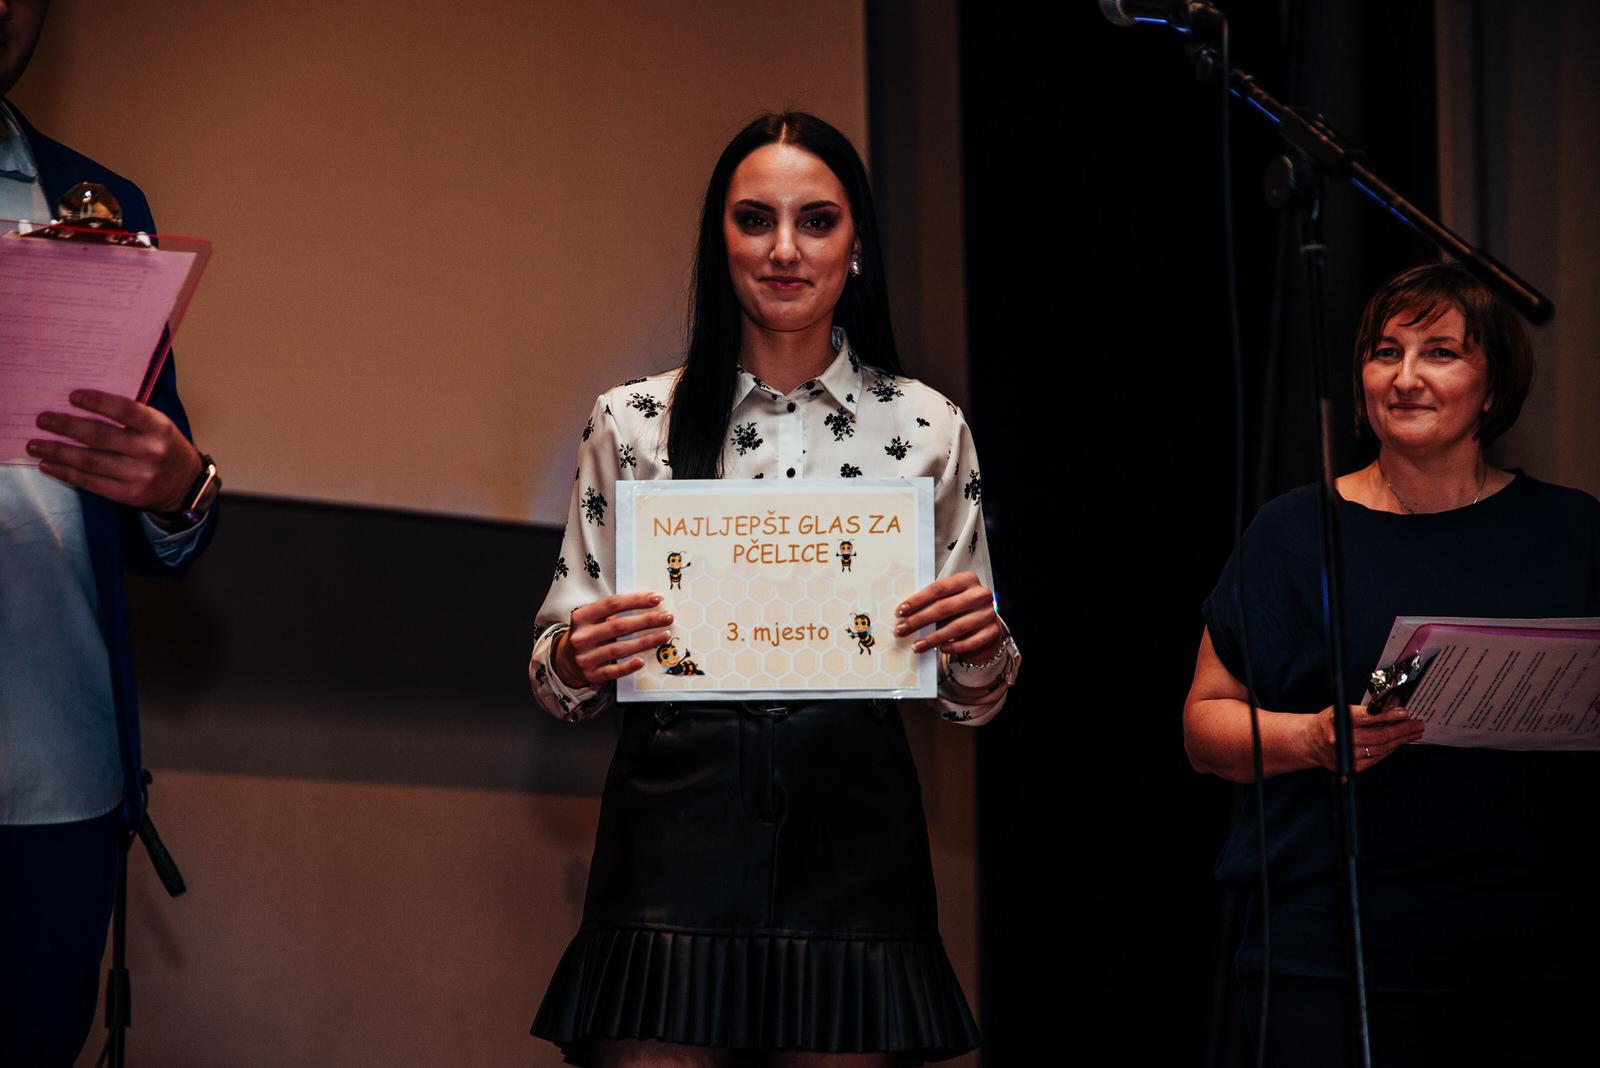 LIKACLUB_Najljepši-glas-za-Pčelice_2019-13